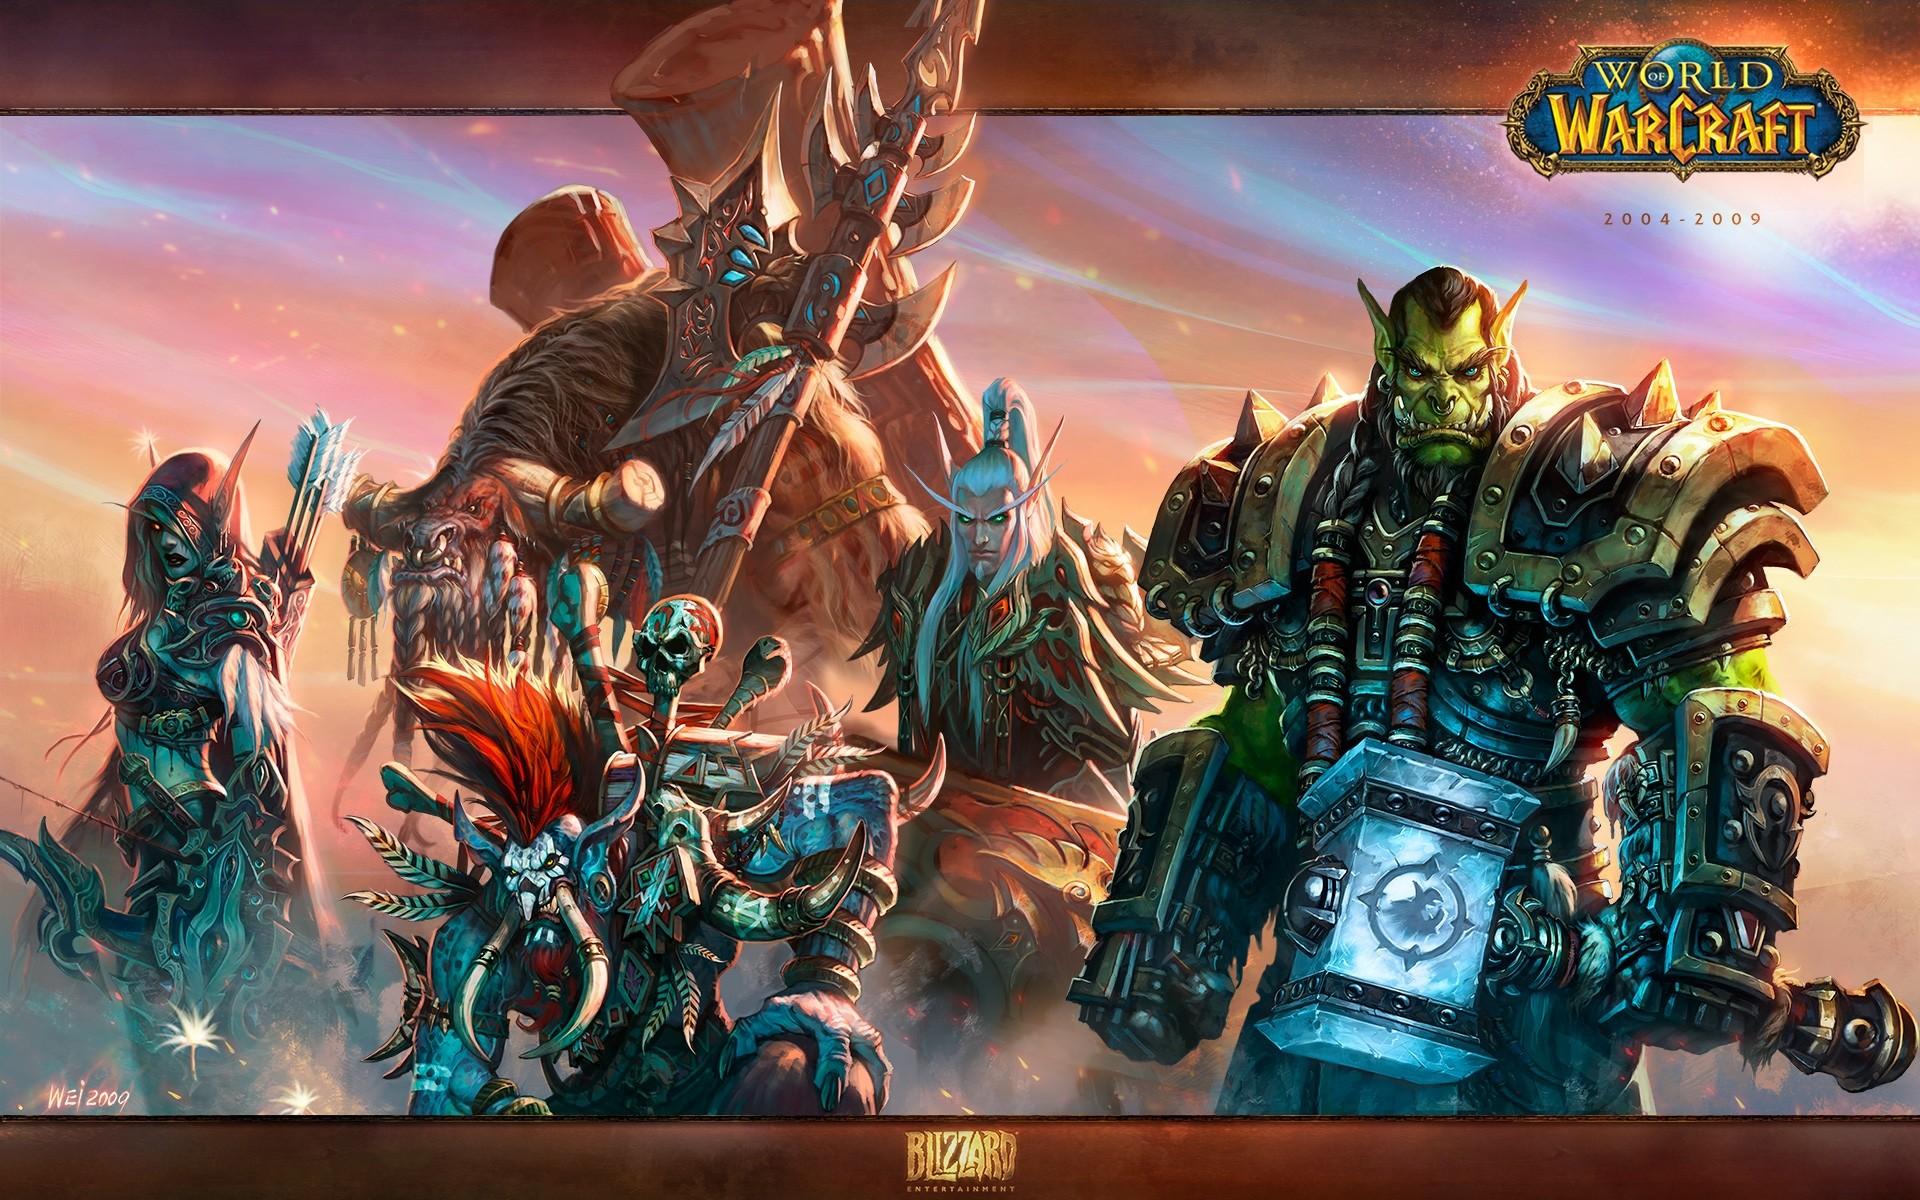 World of Warcraft Mosaic Awesome World of Warcraft Alliance images online